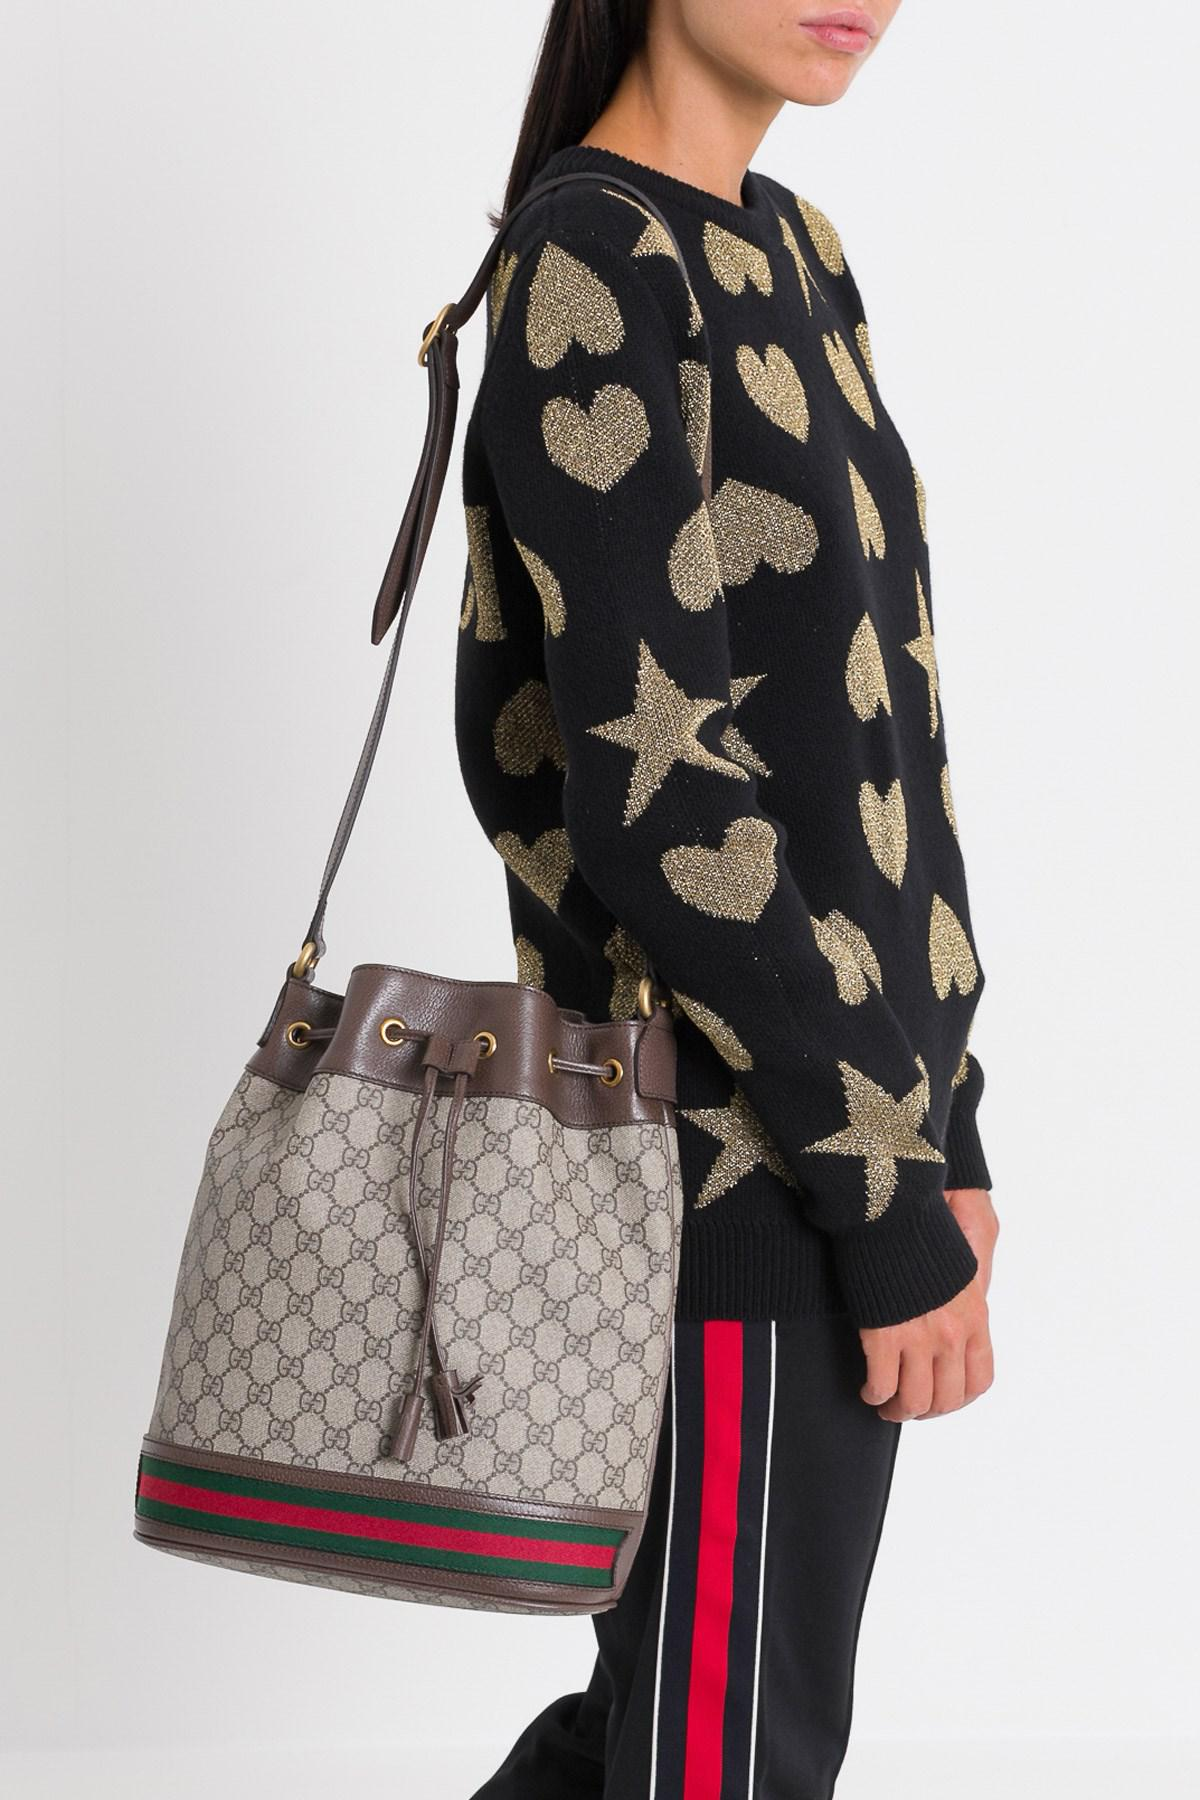 Gucci Ophidia Gg Bucket Bag Lyst